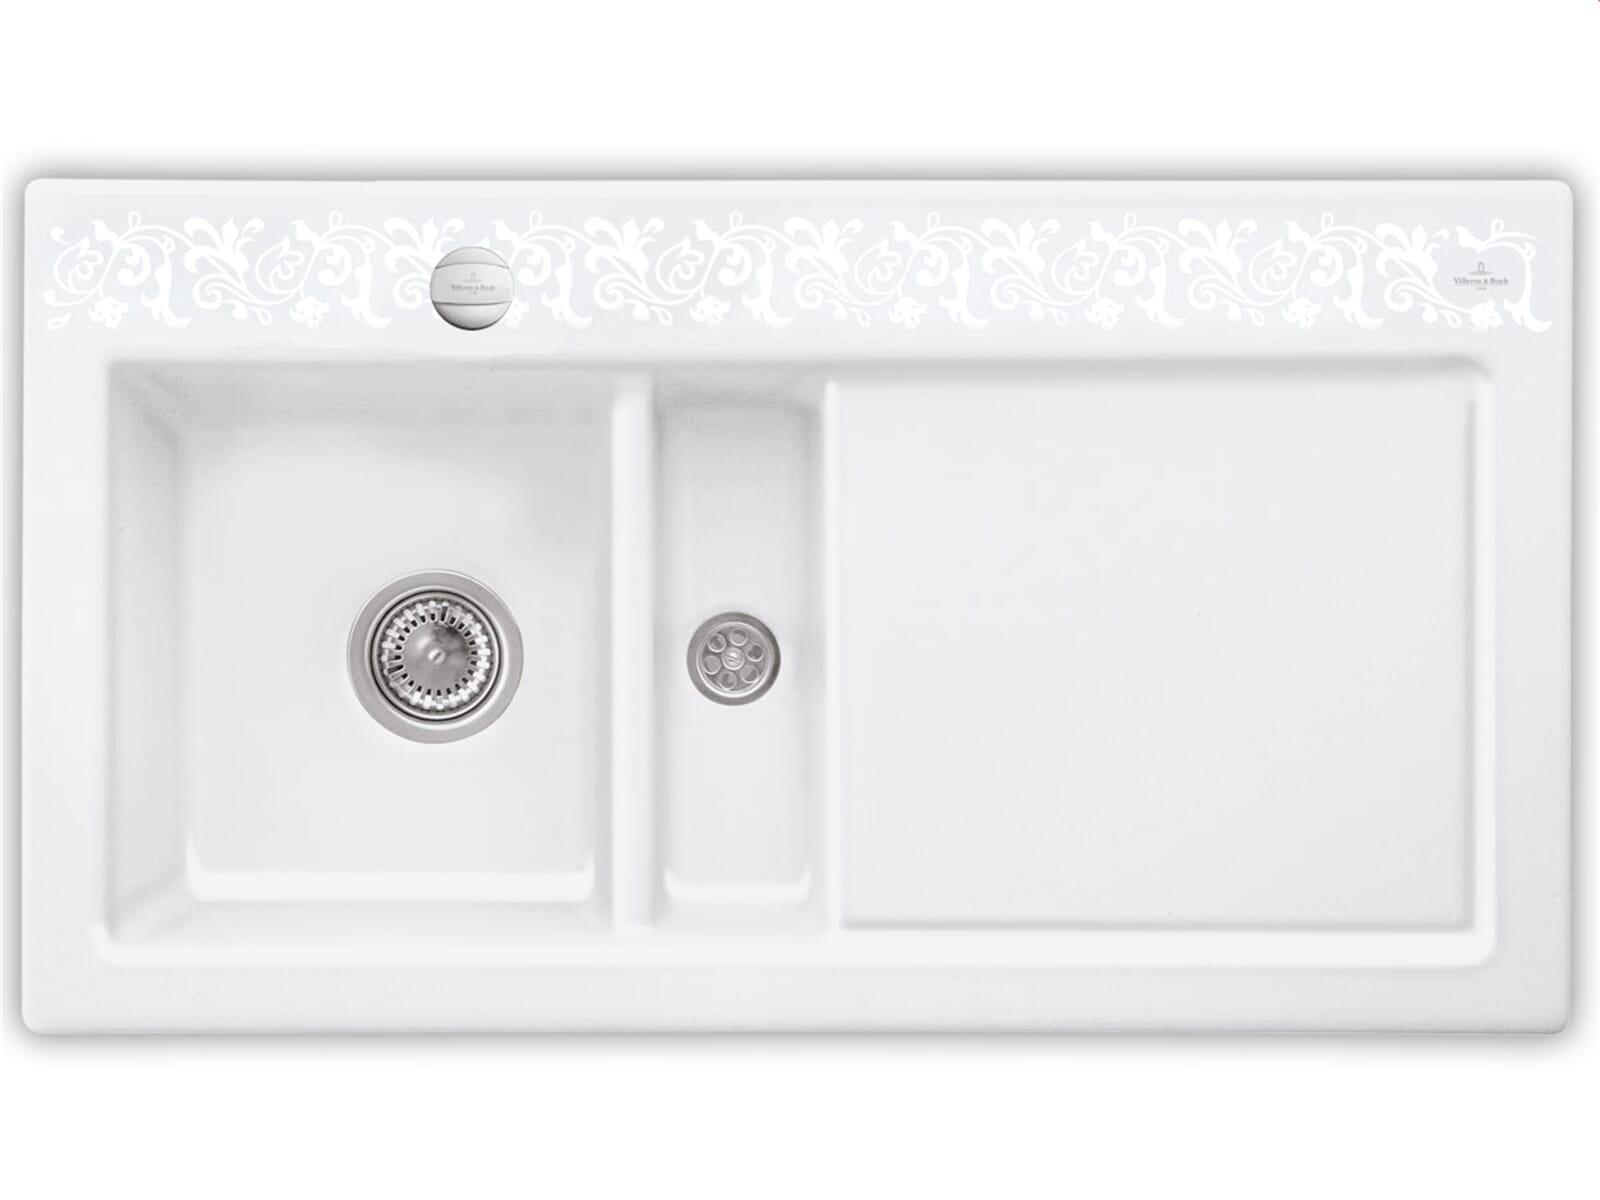 Villeroy & Boch Subway 50 White Pearl - 6773 02 KT Keramikspüle Exzenterbetätigung